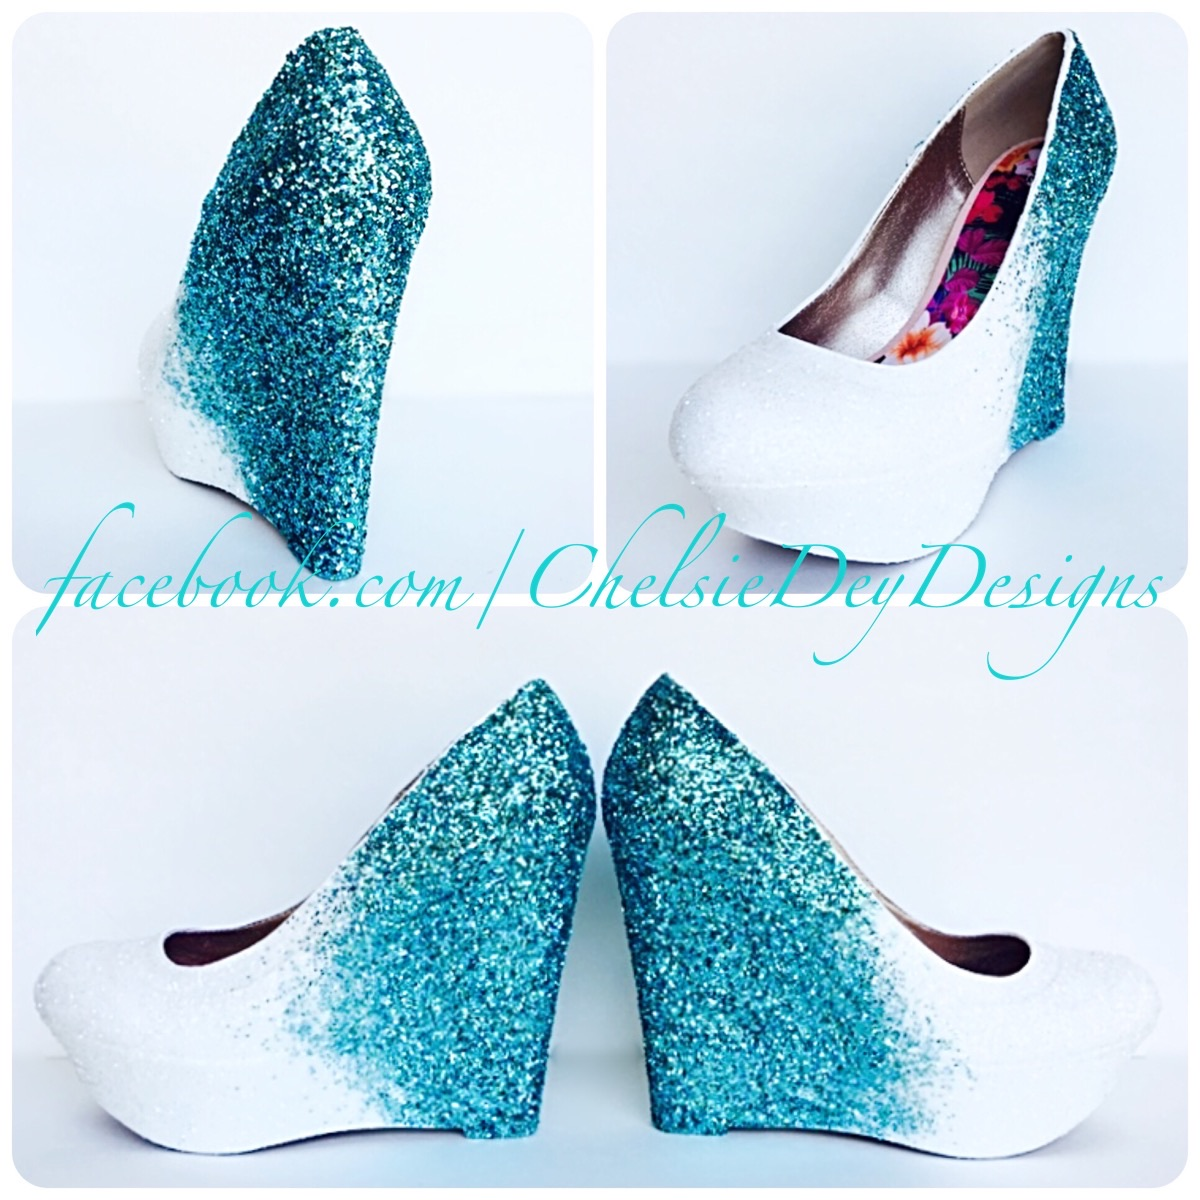 4d9ff60886ac White Ombre Glitter Wedges - Aqua Light Blue Heels - Tiffany Blue ...